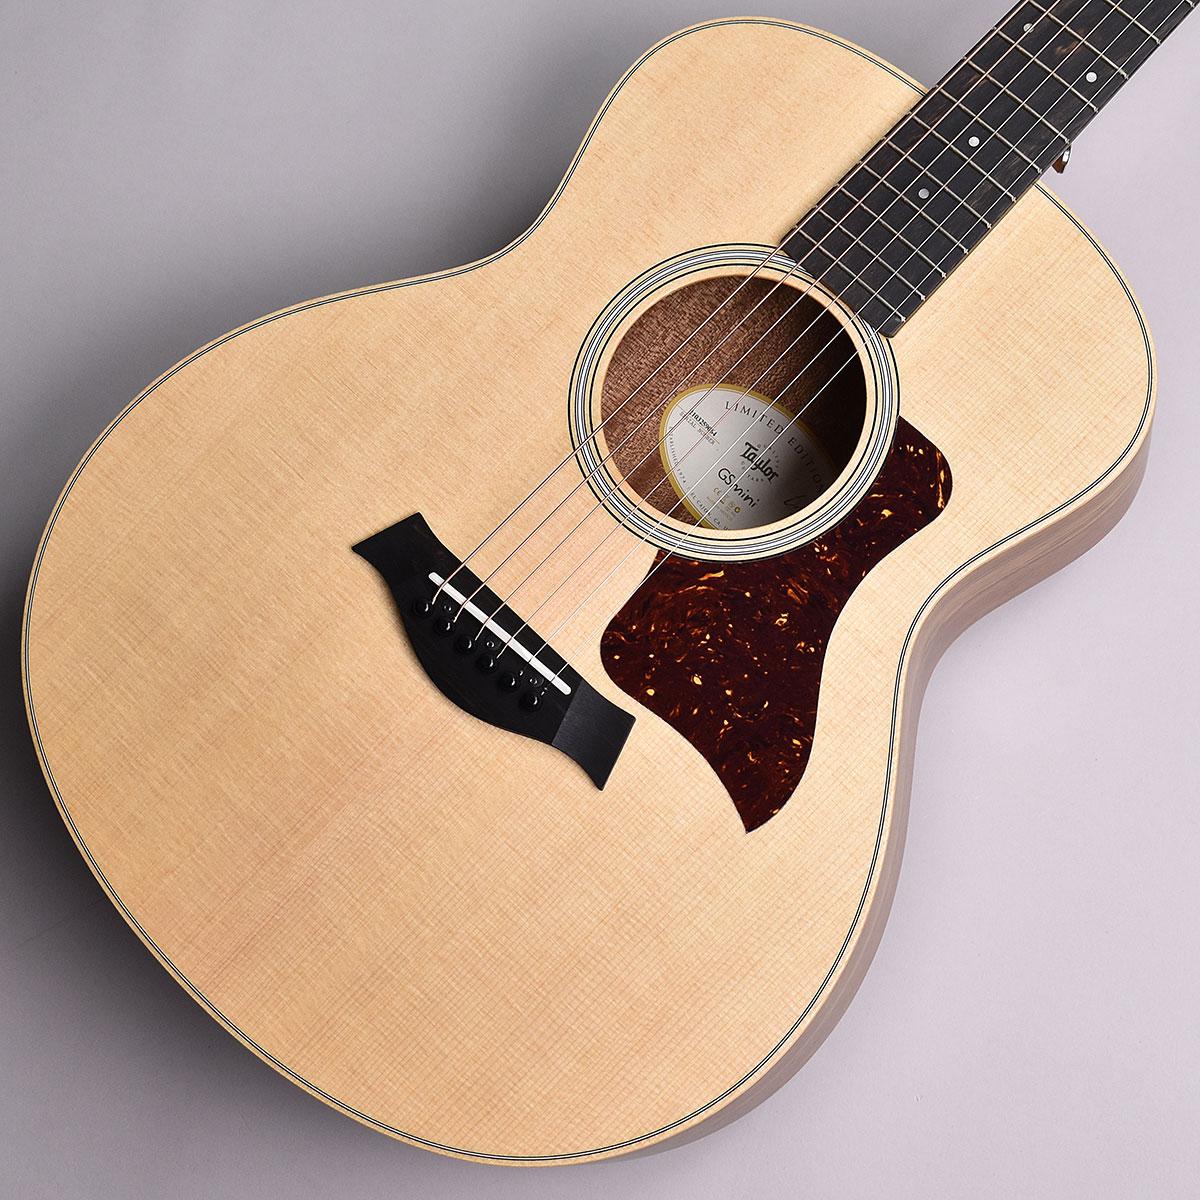 Taylor GS Mini-e Ovangkol Limited S/N:2103259064 ミニアコースティックギター【エレアコ】 【テイラー】【未展示品】